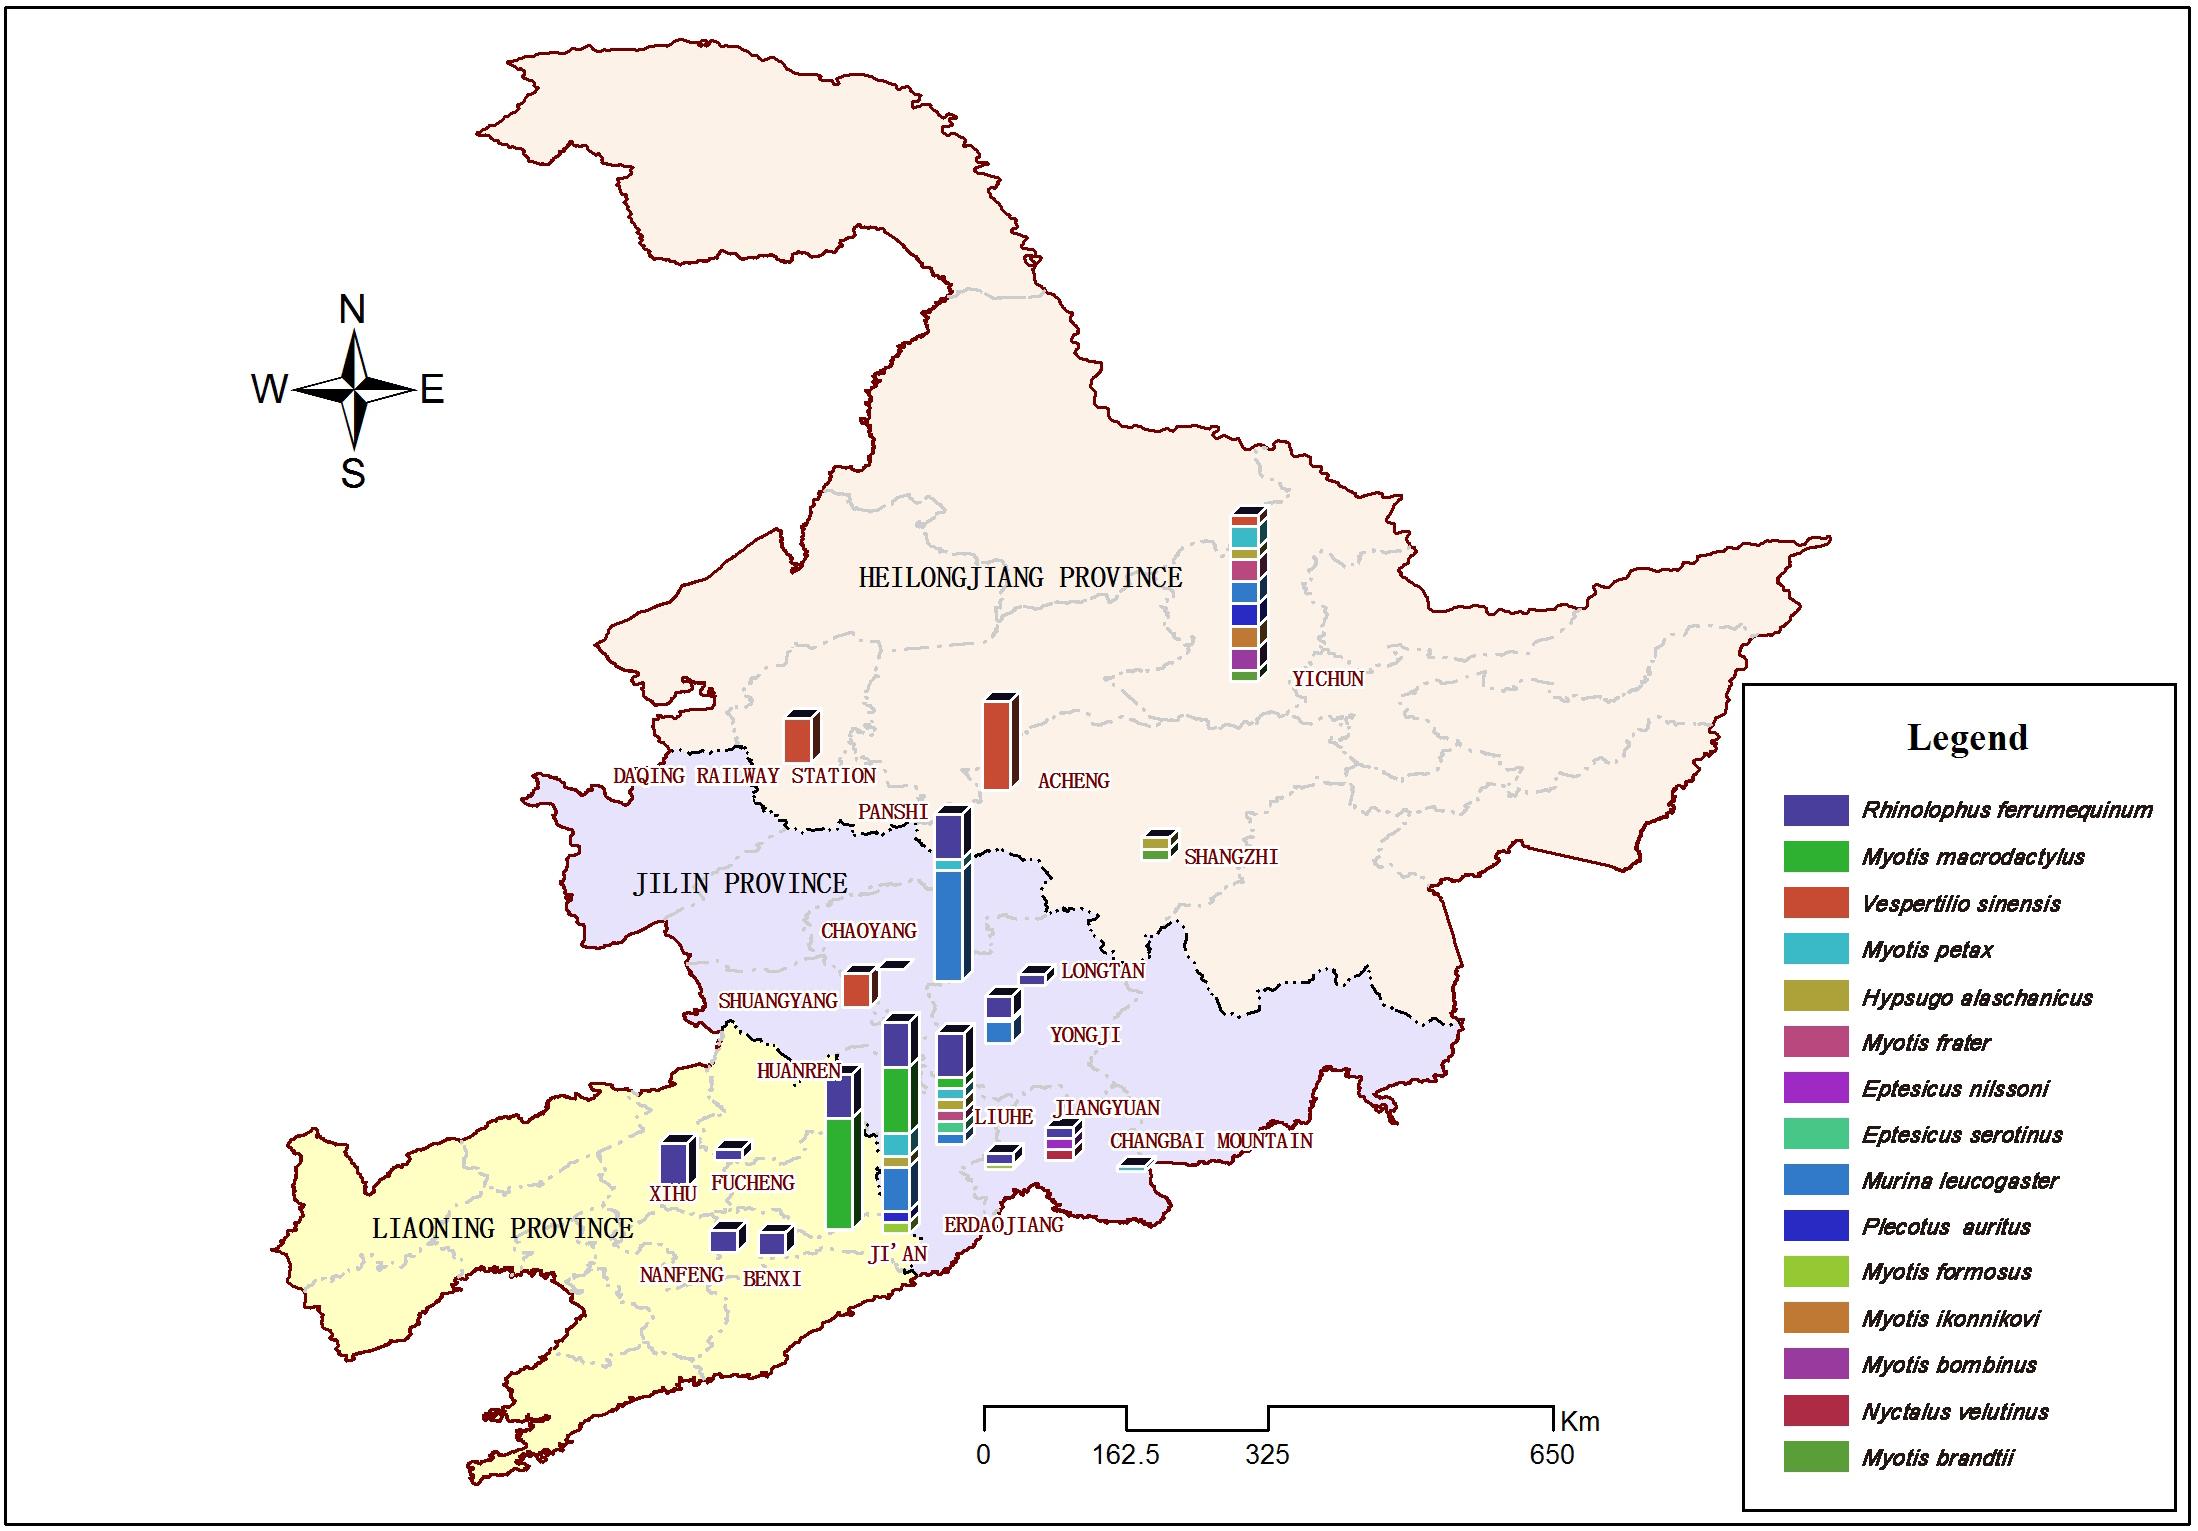 samples-吉林省动物资源保护与利用重点实验室